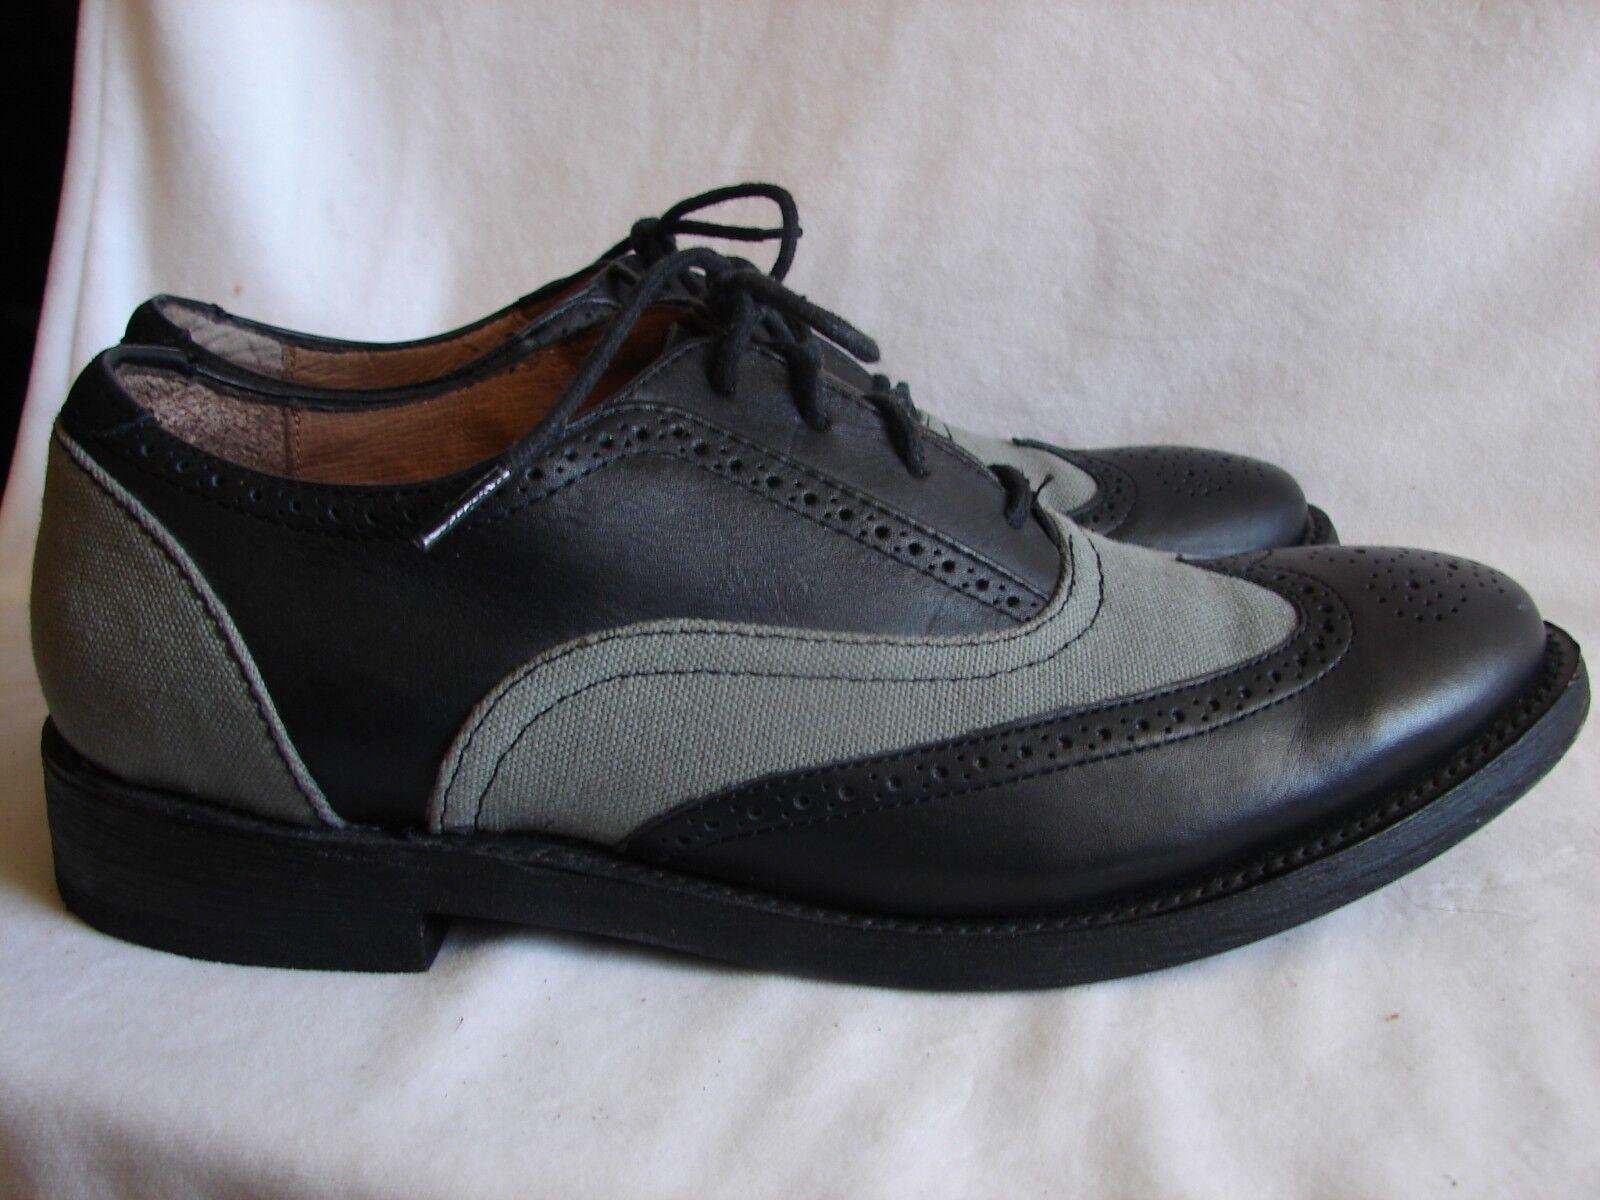 J.D. Fisk Leather Wingtip Oxfords Men's US Size 9